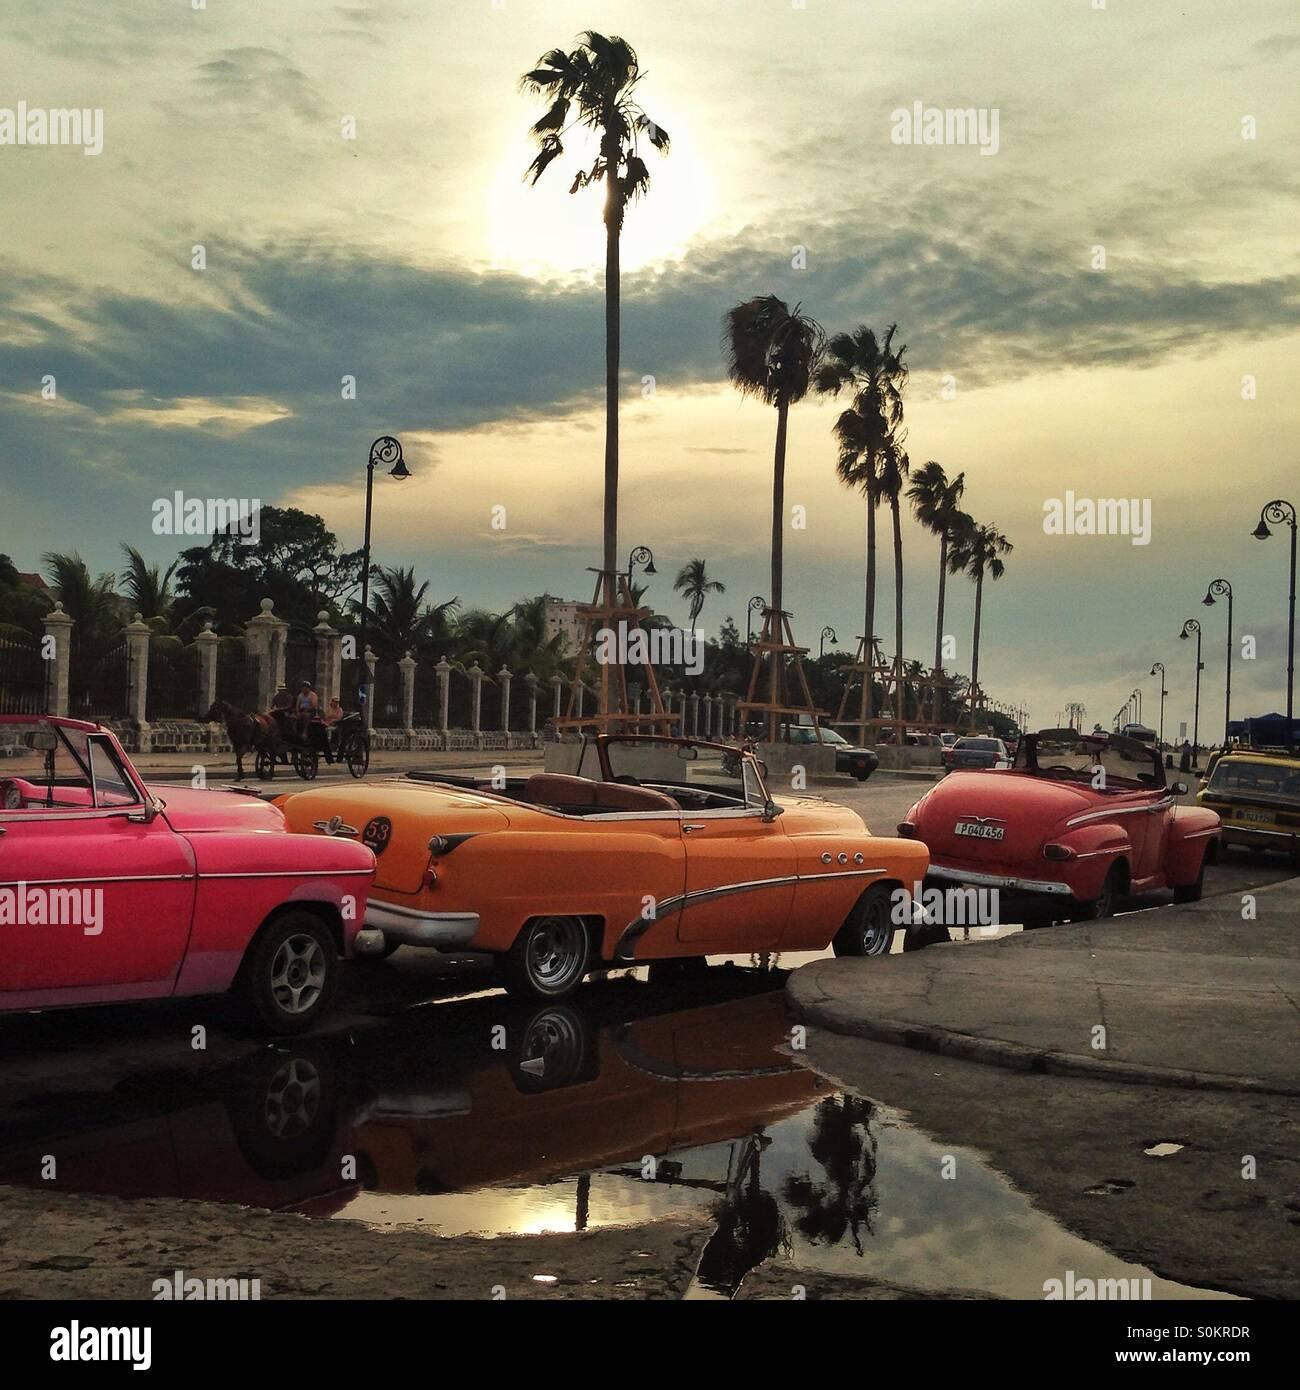 Klassische Autos aufgereiht auf dem Malecon, Havanna, Kuba Stockbild